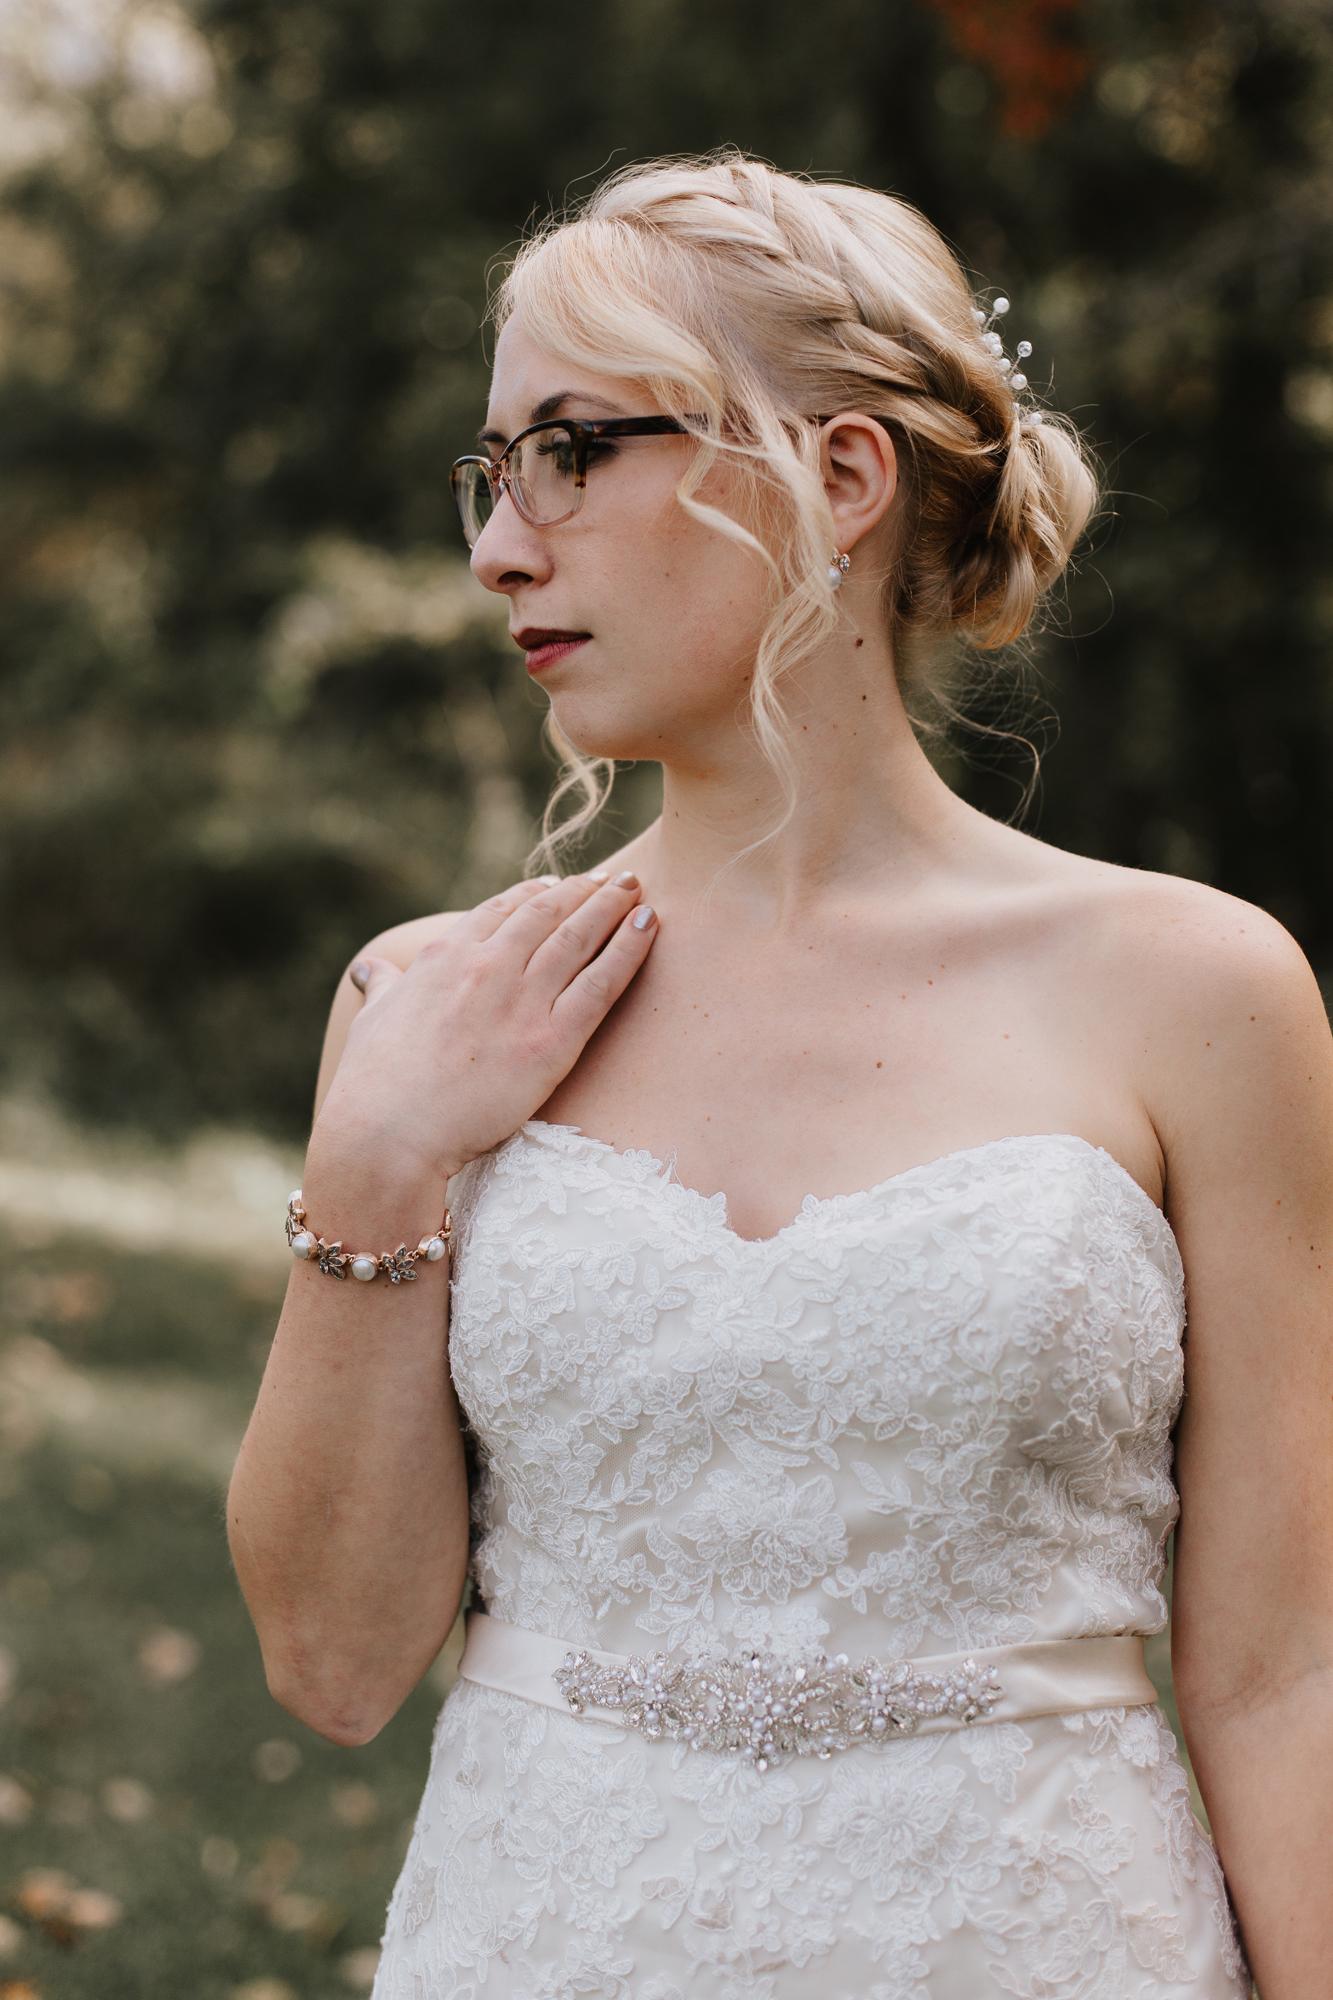 wedding-day-bride-portrait-lehigh-valley-photography